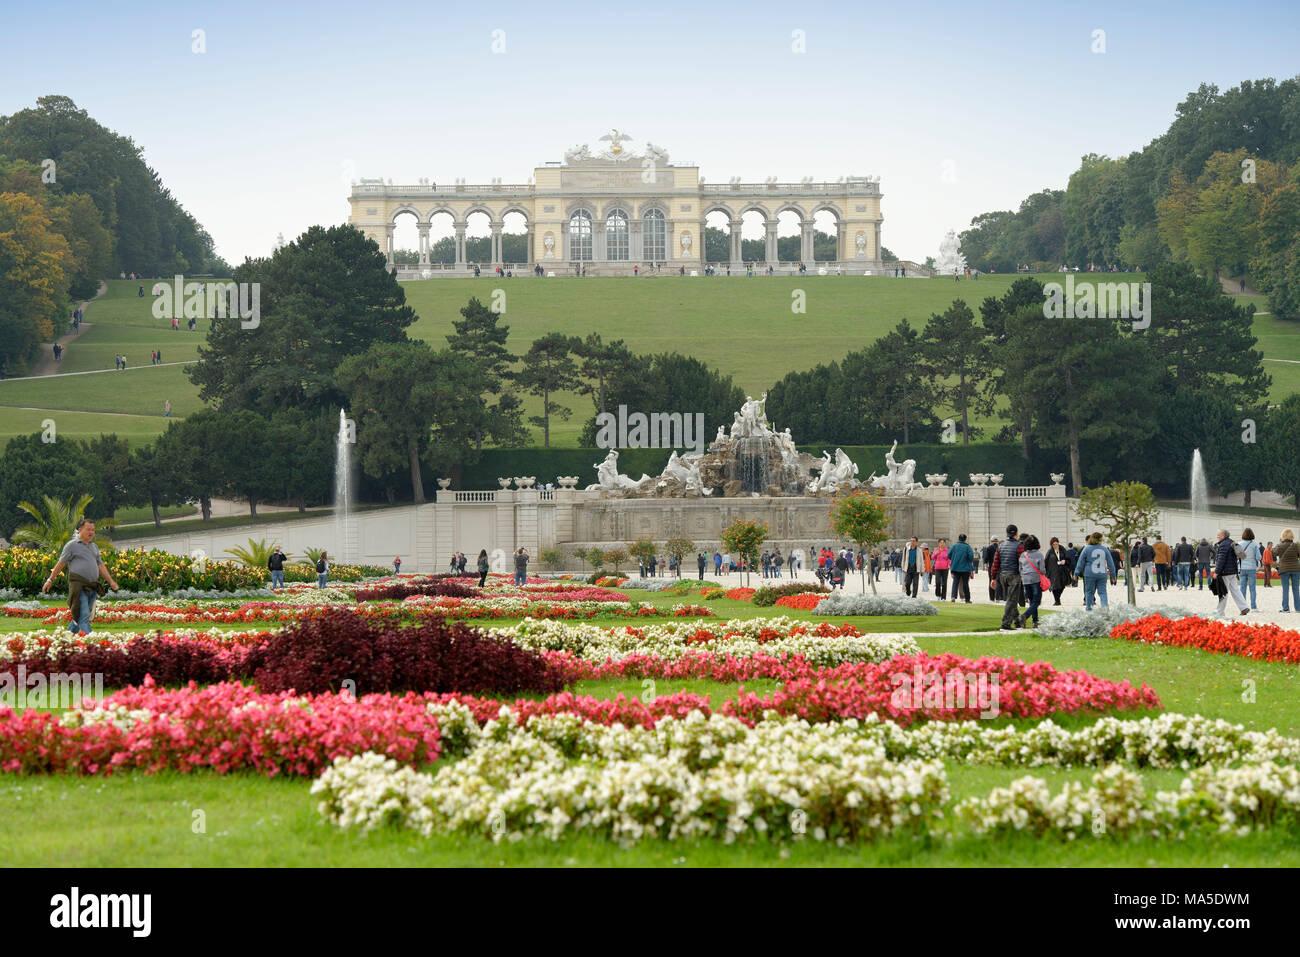 Palace garden of Schönbrunn Palace with Neptune Fountain and Gloriette, Vienna, Austria - Stock Image